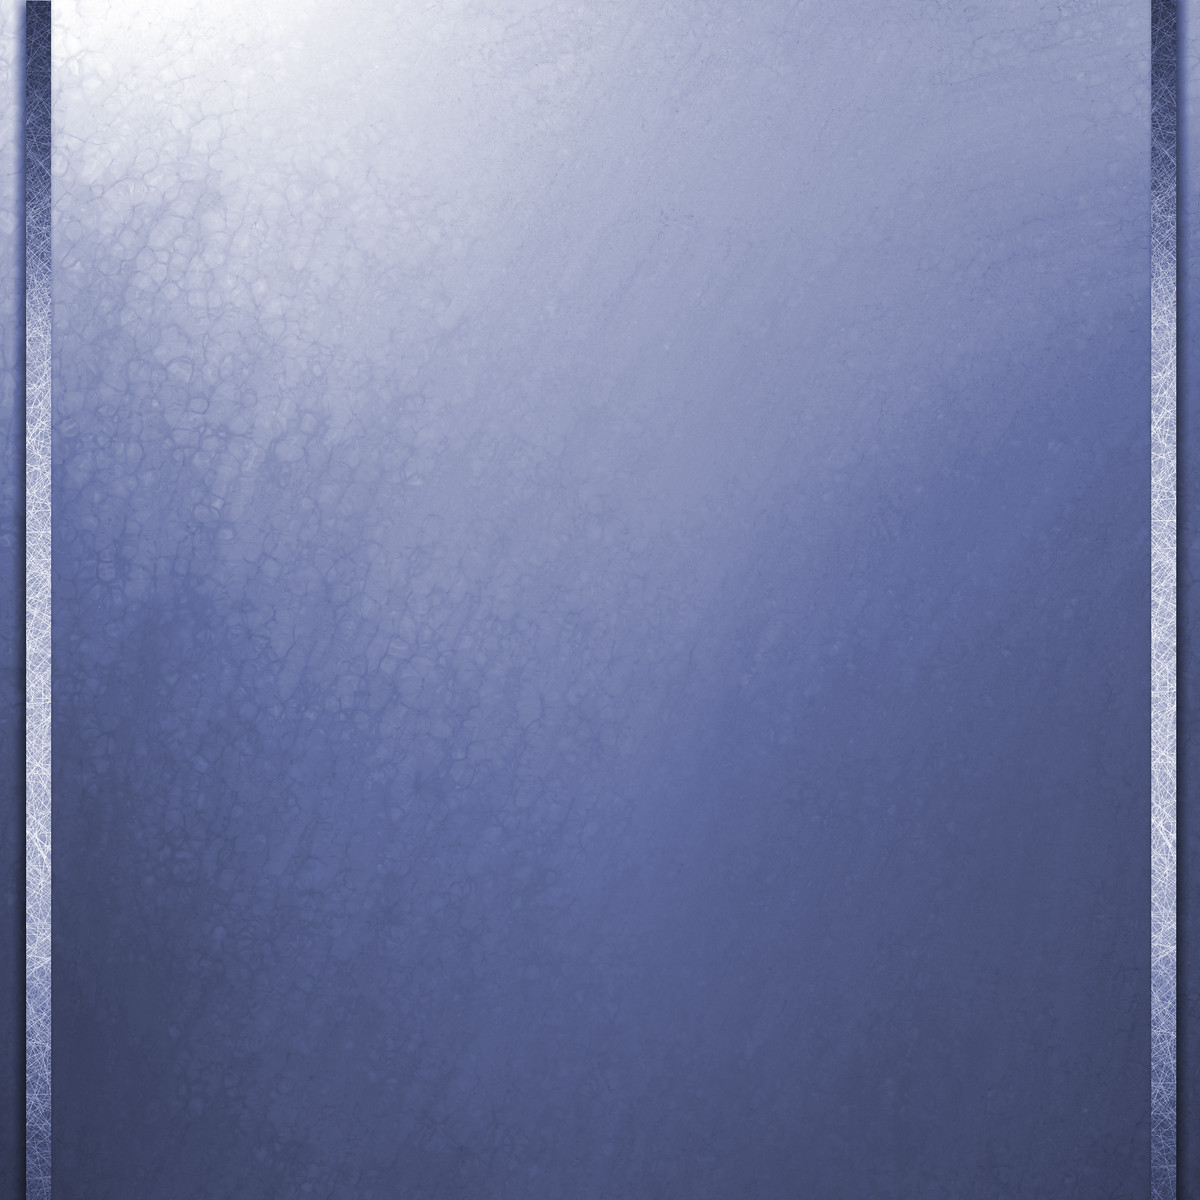 old vintage blue gray background illustration with blue ribbon trim or accent design, distressed old texture, blue paint, old blue background paper